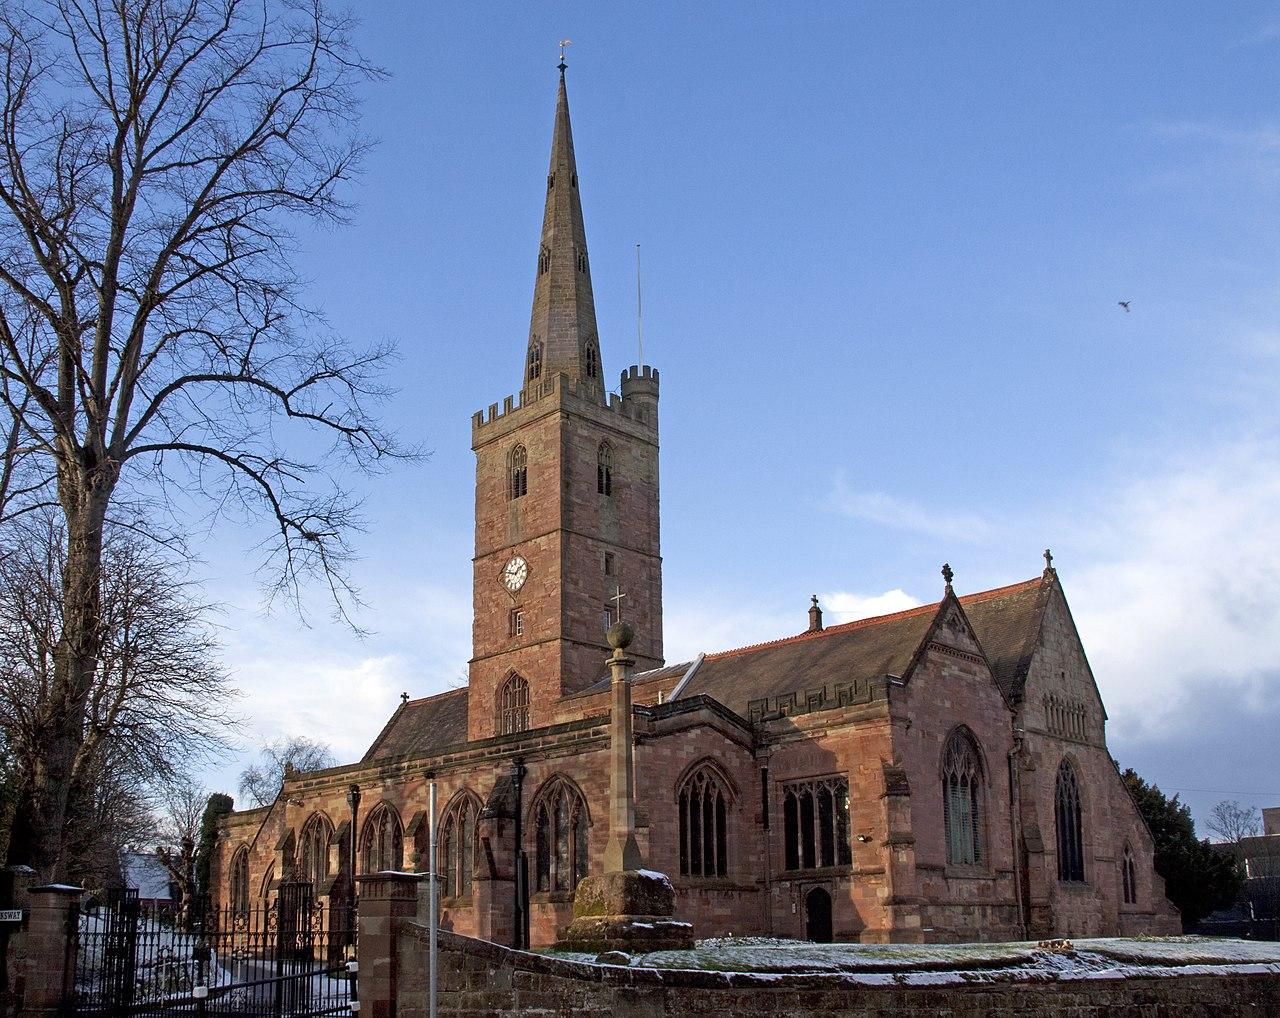 Halesowen Church